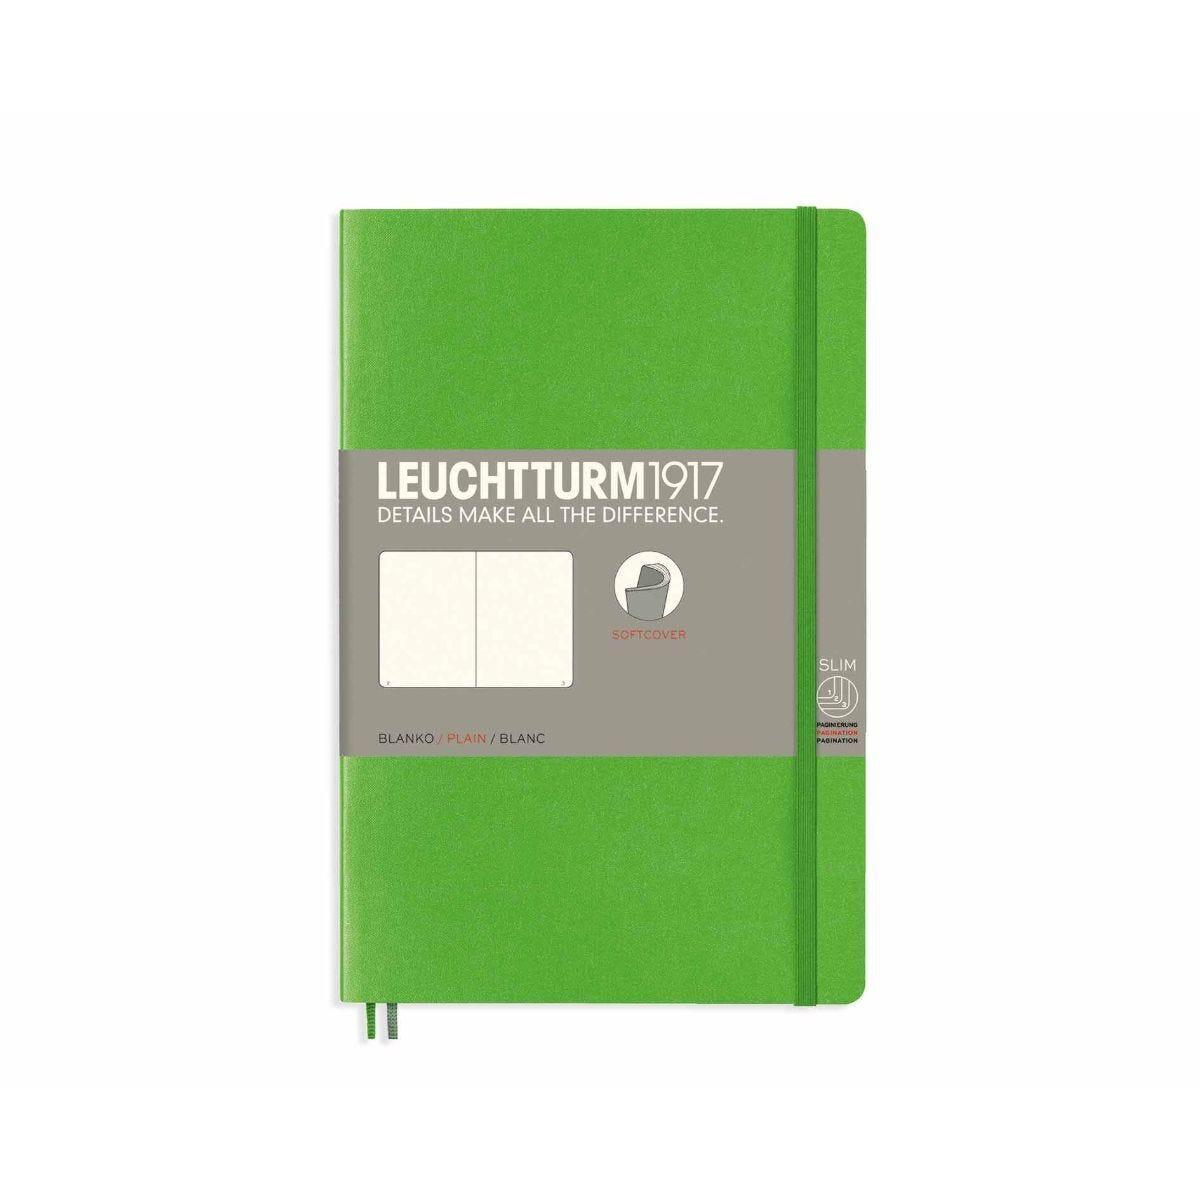 Leuchtturm1917 Soft Cover Notebook Plain B6 Plus Fresh Green